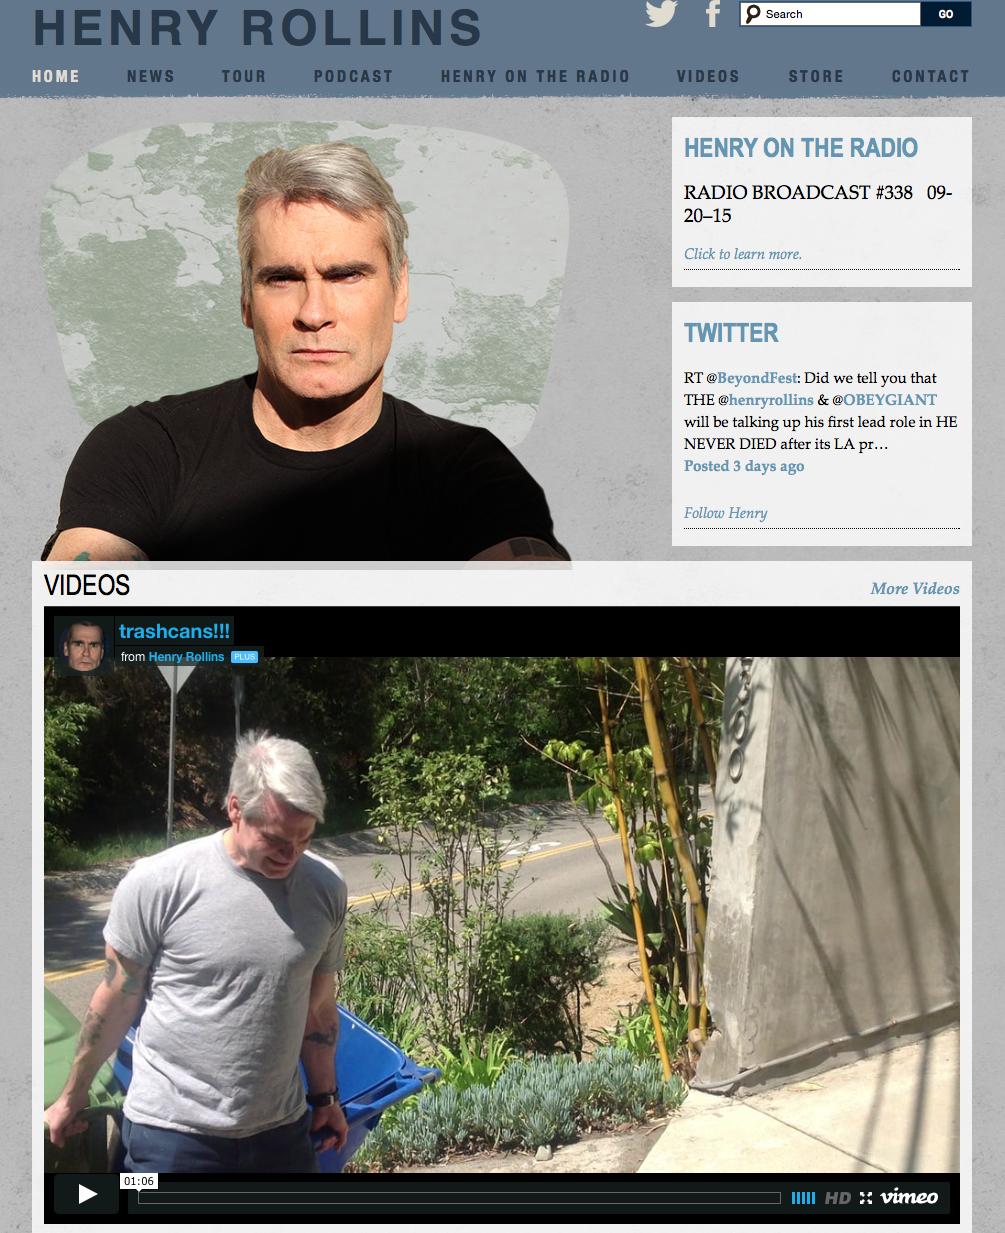 Henry Rollins website